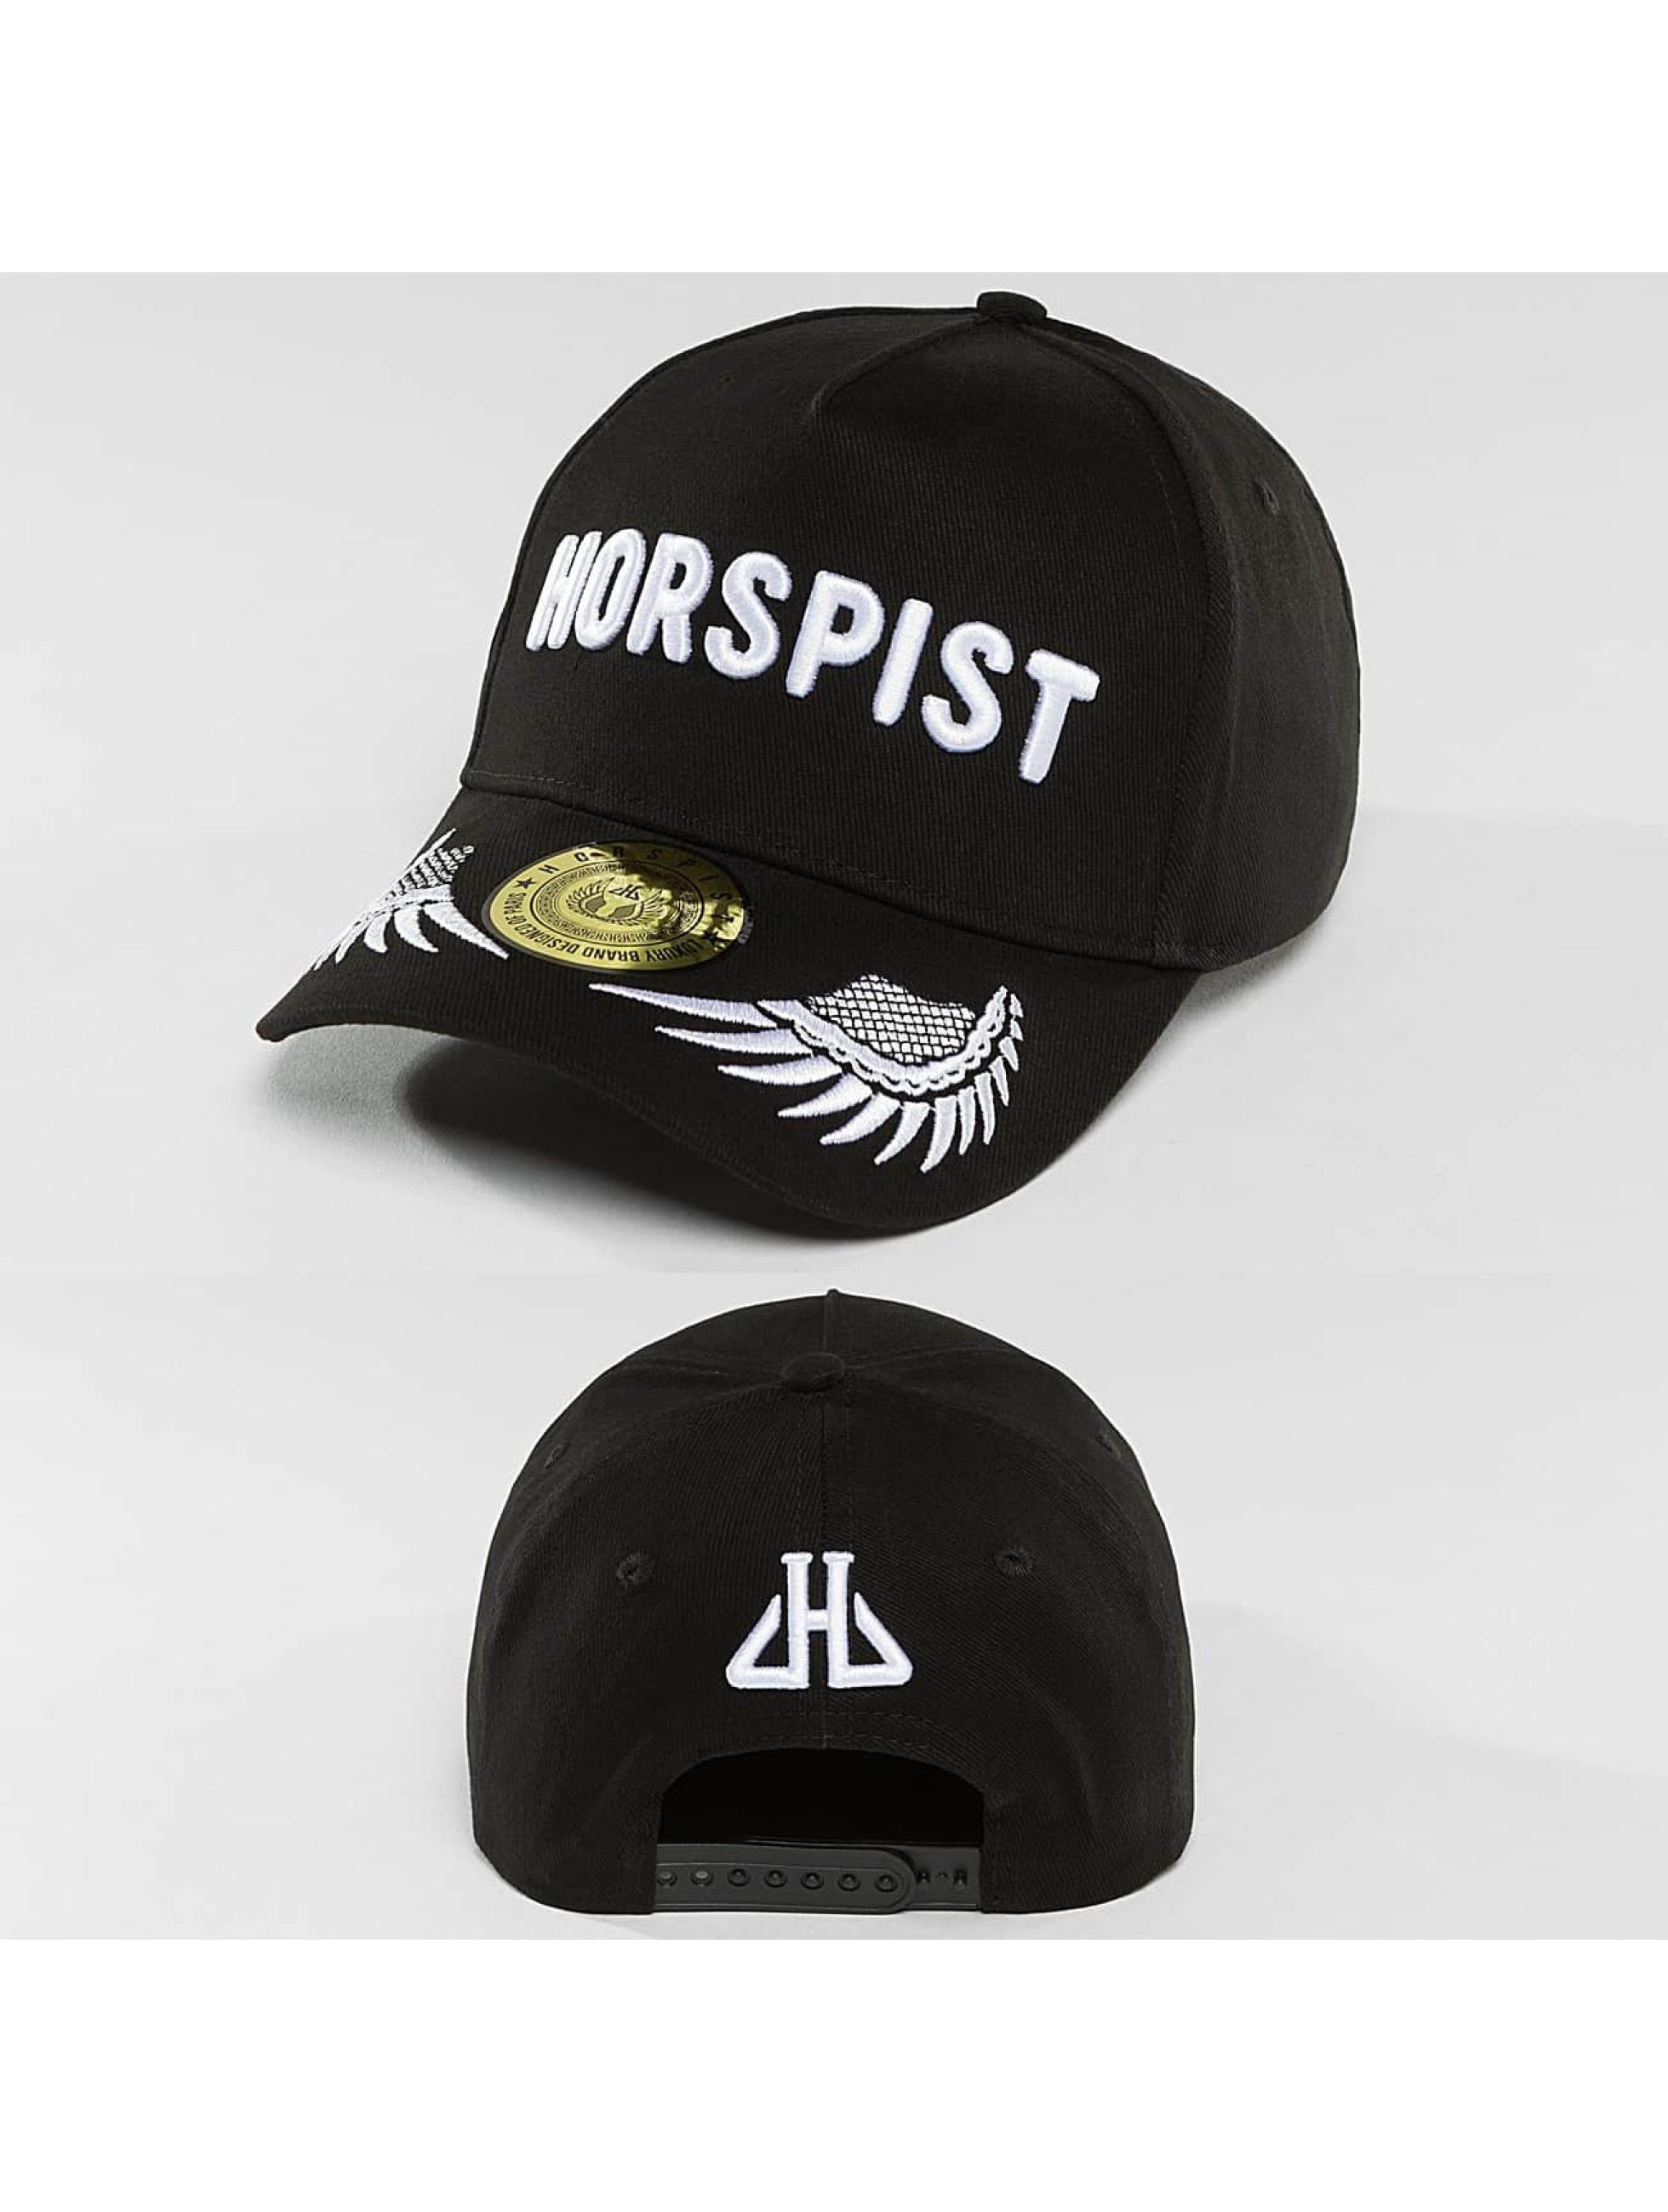 Horspist Casquette Snapback & Strapback Remenber noir